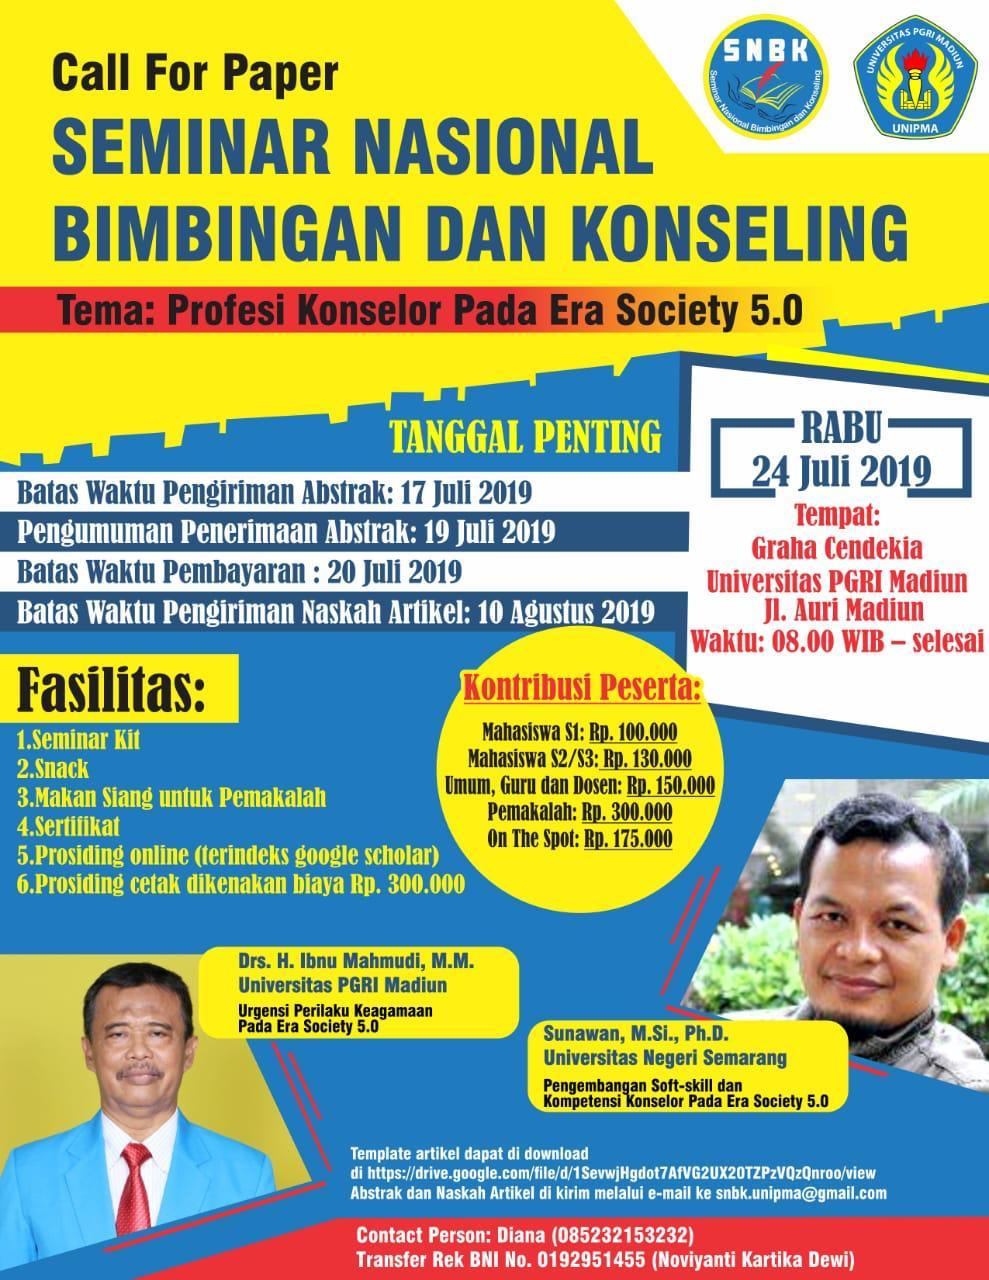 Seminar Nasional Bimbingan dan Konseling